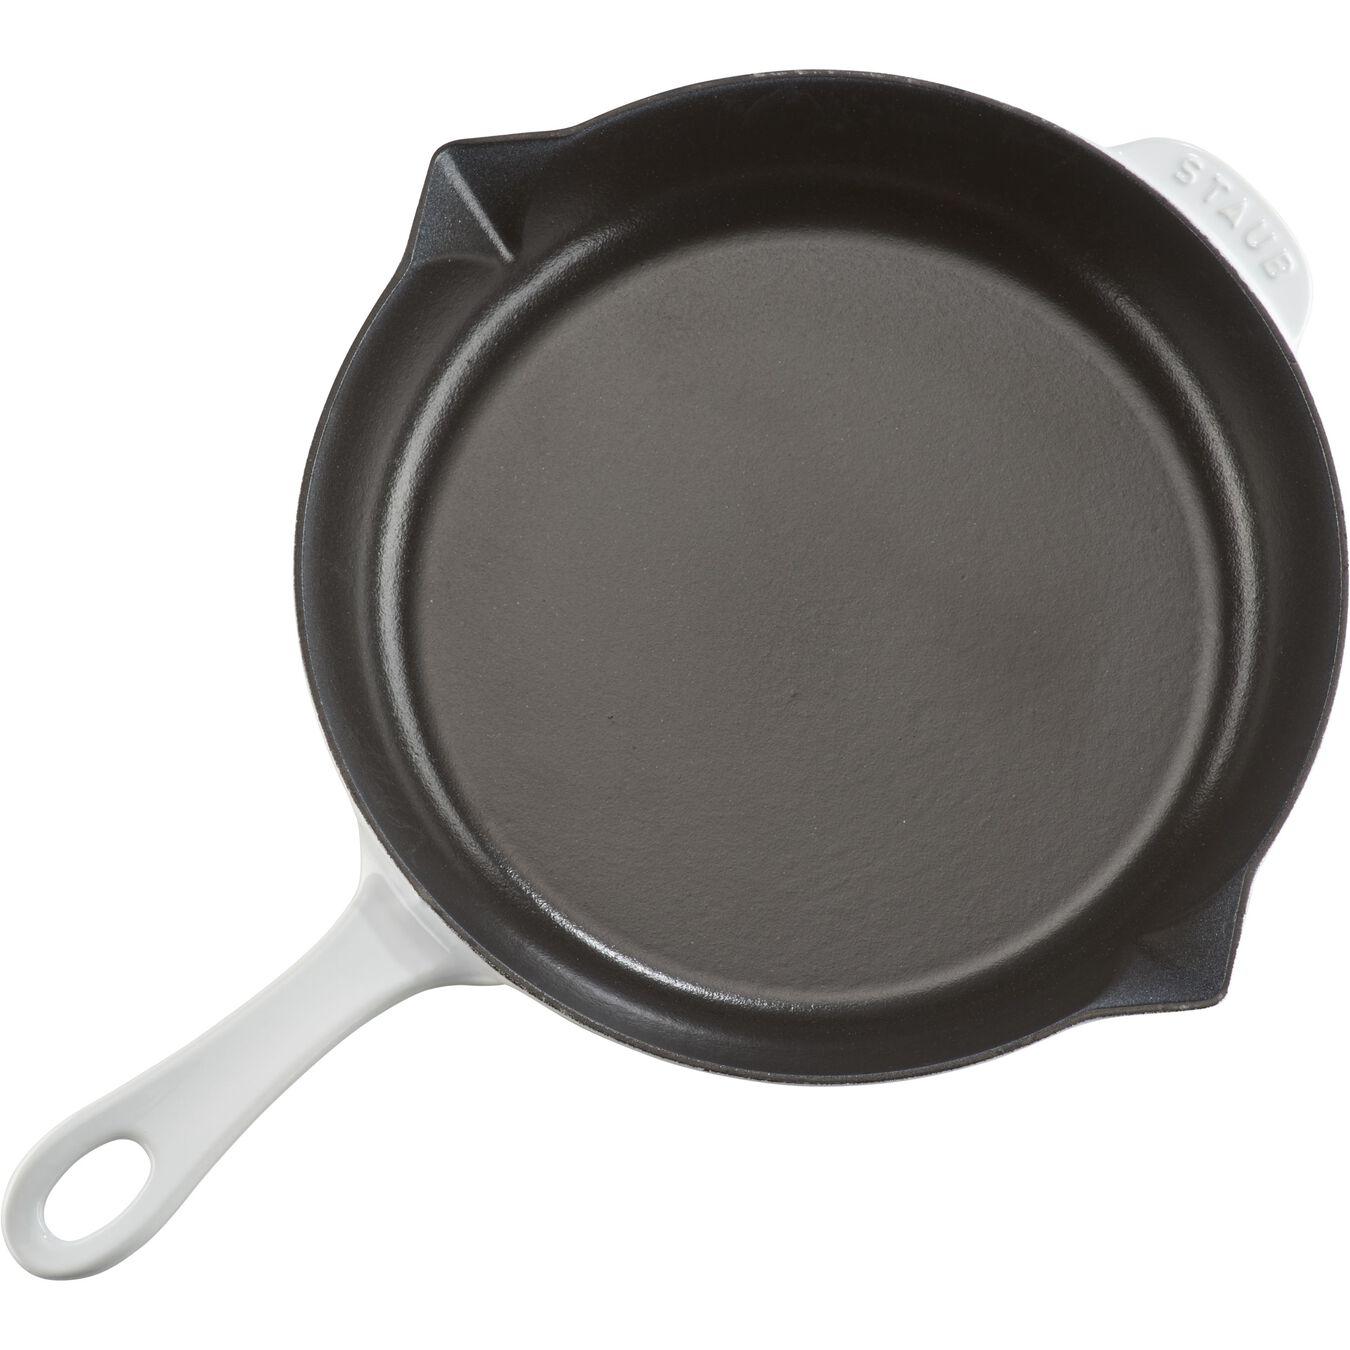 10-inch Fry Pan - White,,large 2